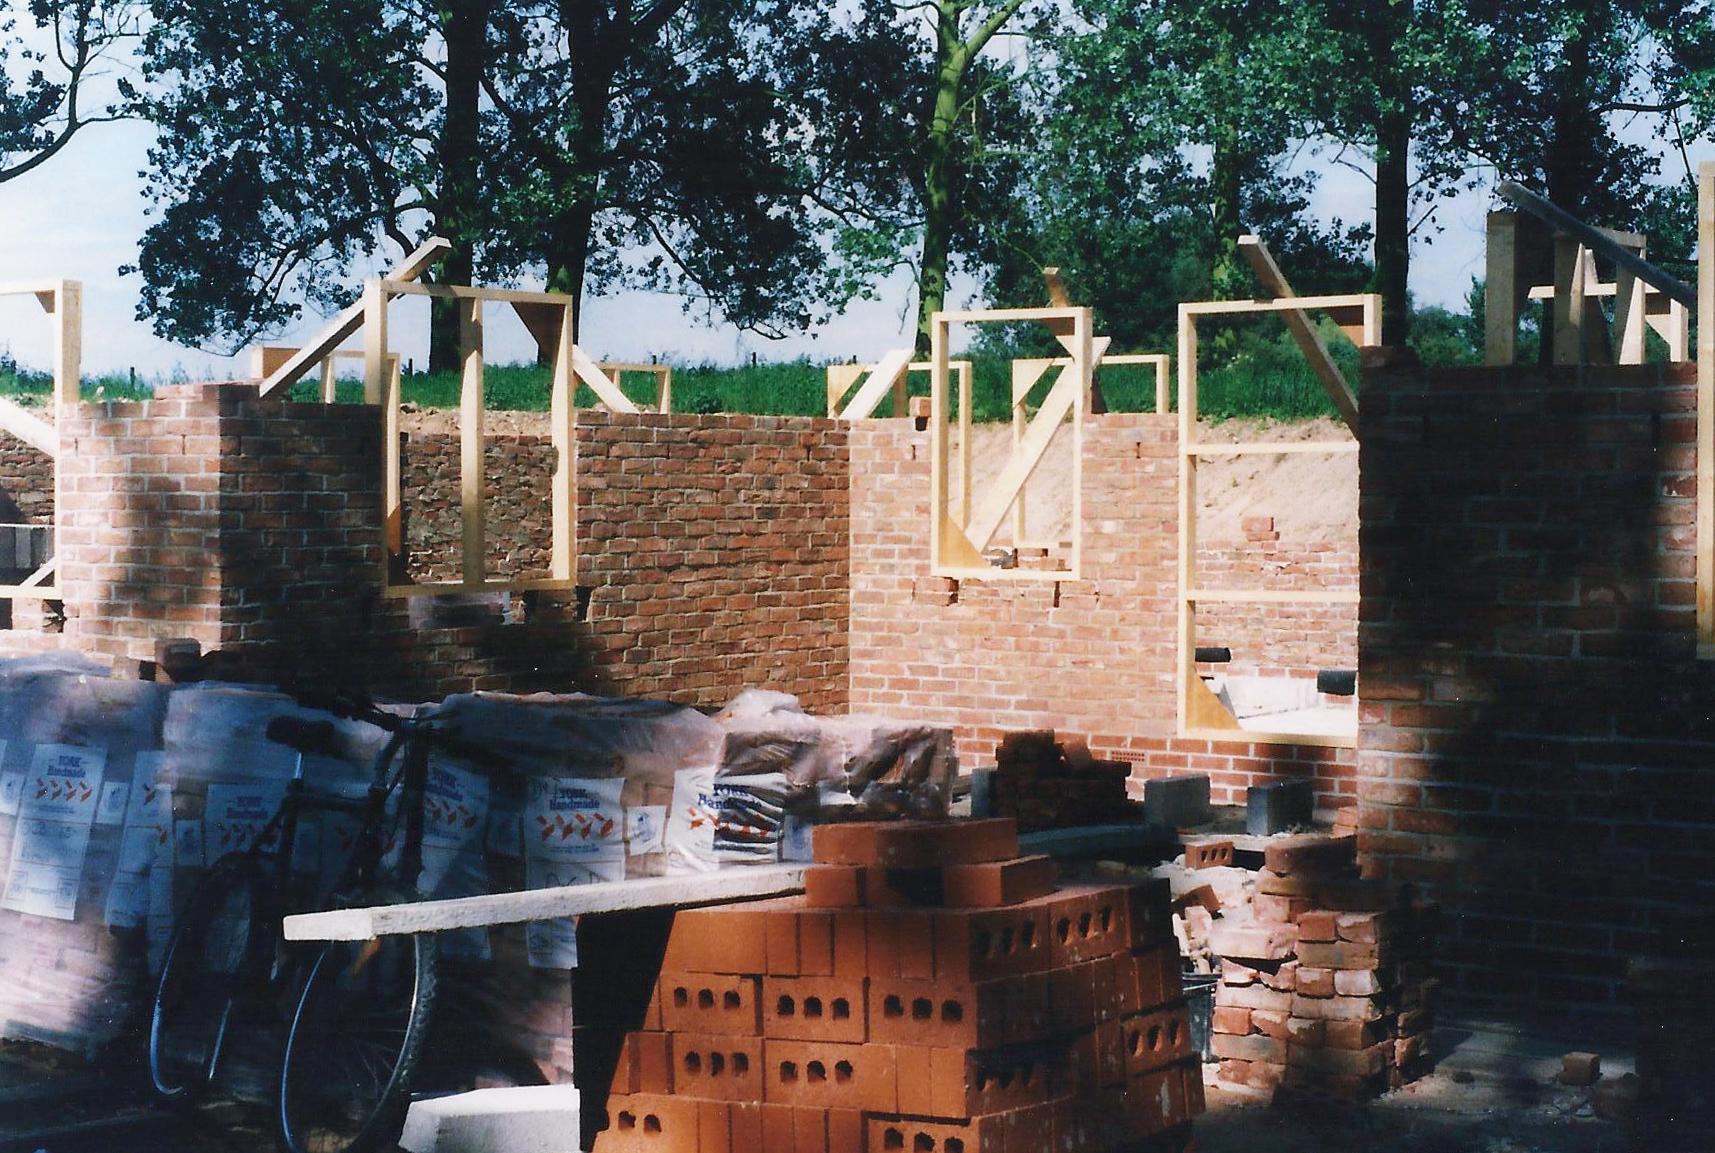 North End Farm Construction 4 - East Yorkshire Architects - Samuel Kendall Associates.jpg